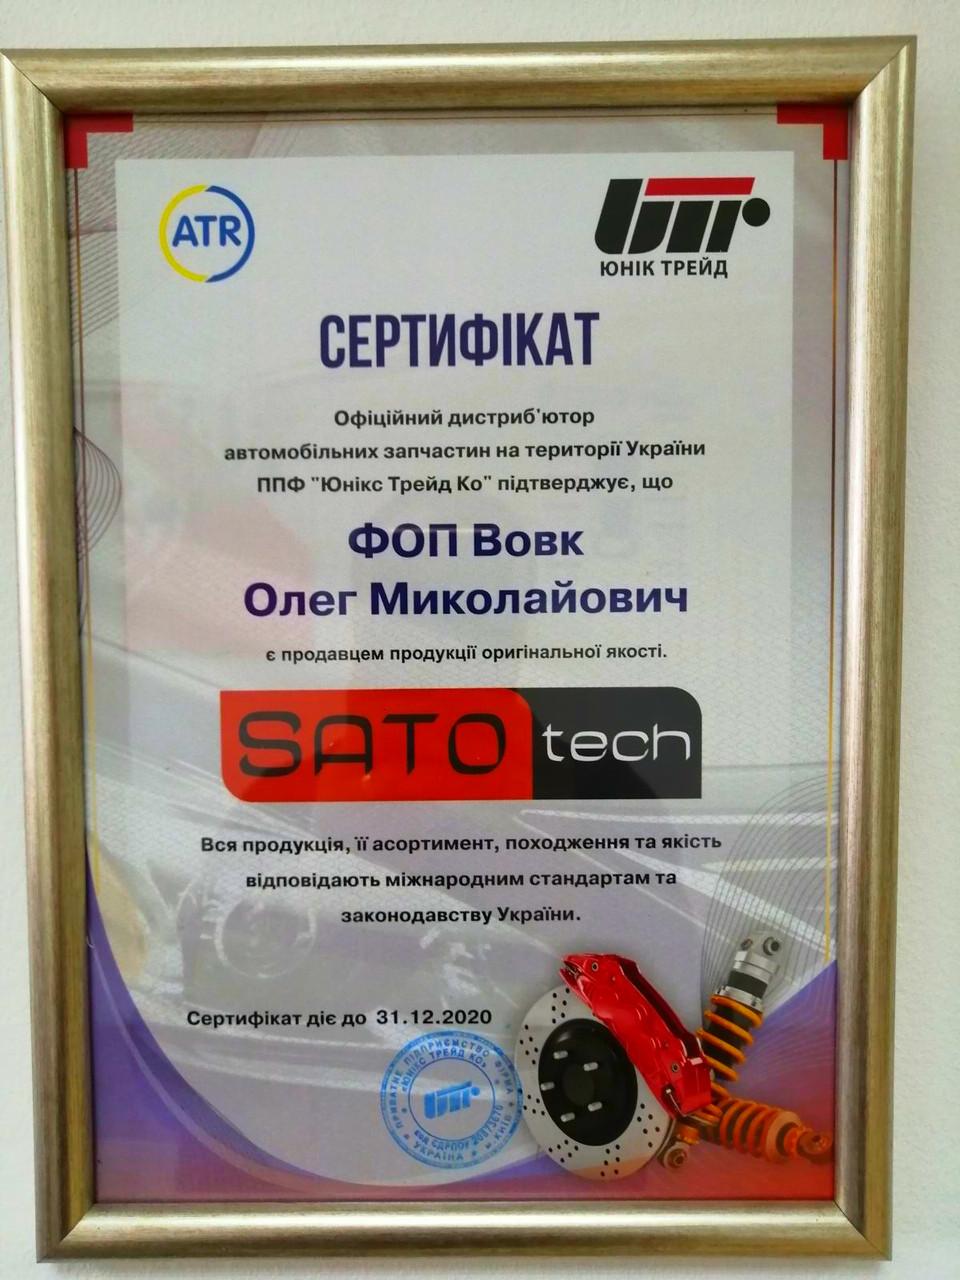 SATO Амортизатор BMW 5 Series (F10) 09-